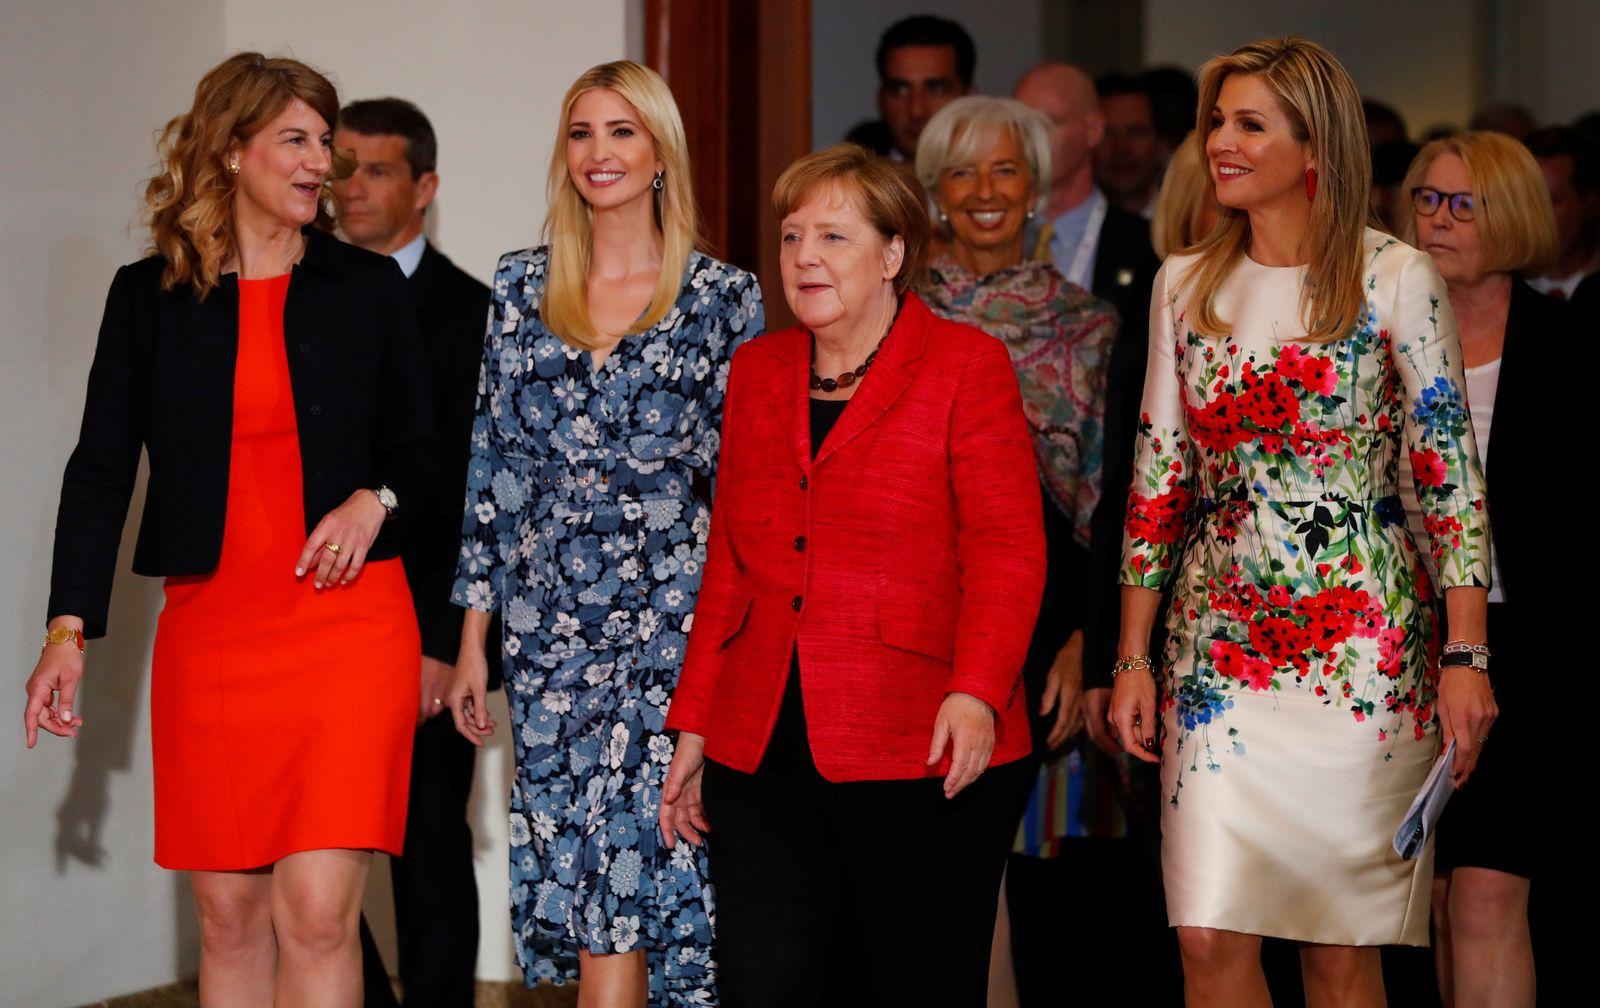 Ivanka Trump / Angela Merkel / Maxima